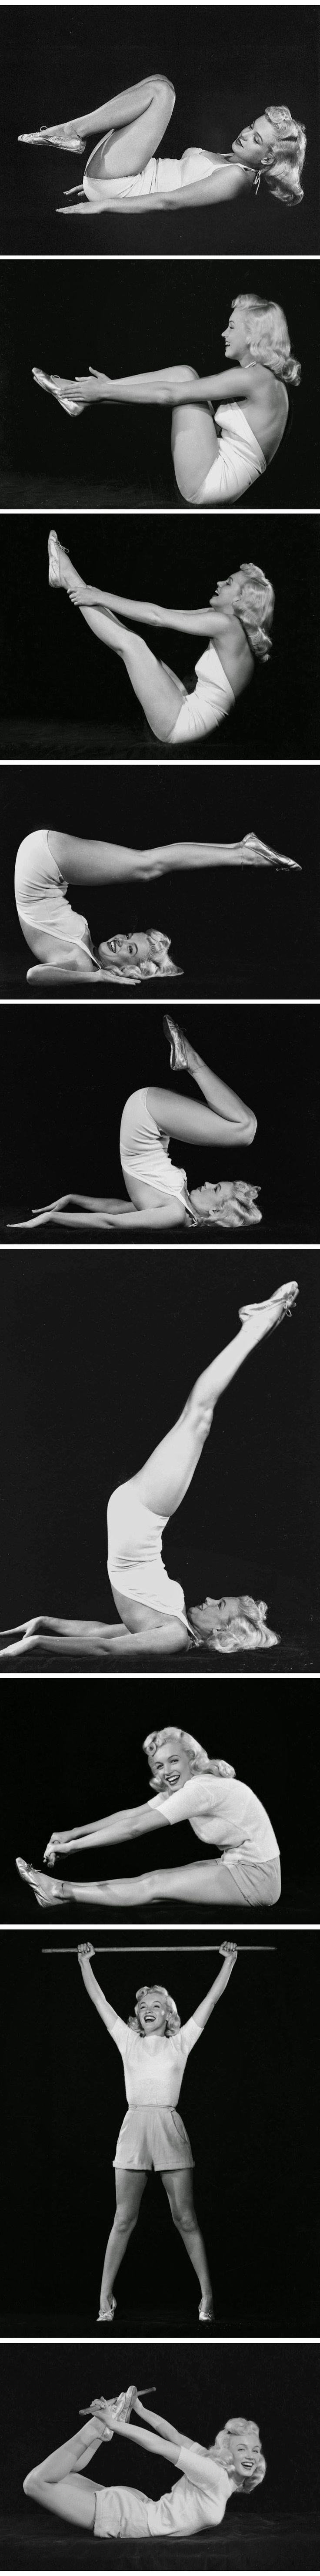 Historical Rare Vintage Photographs of Marilyn Monroe doing Yoga (1948)